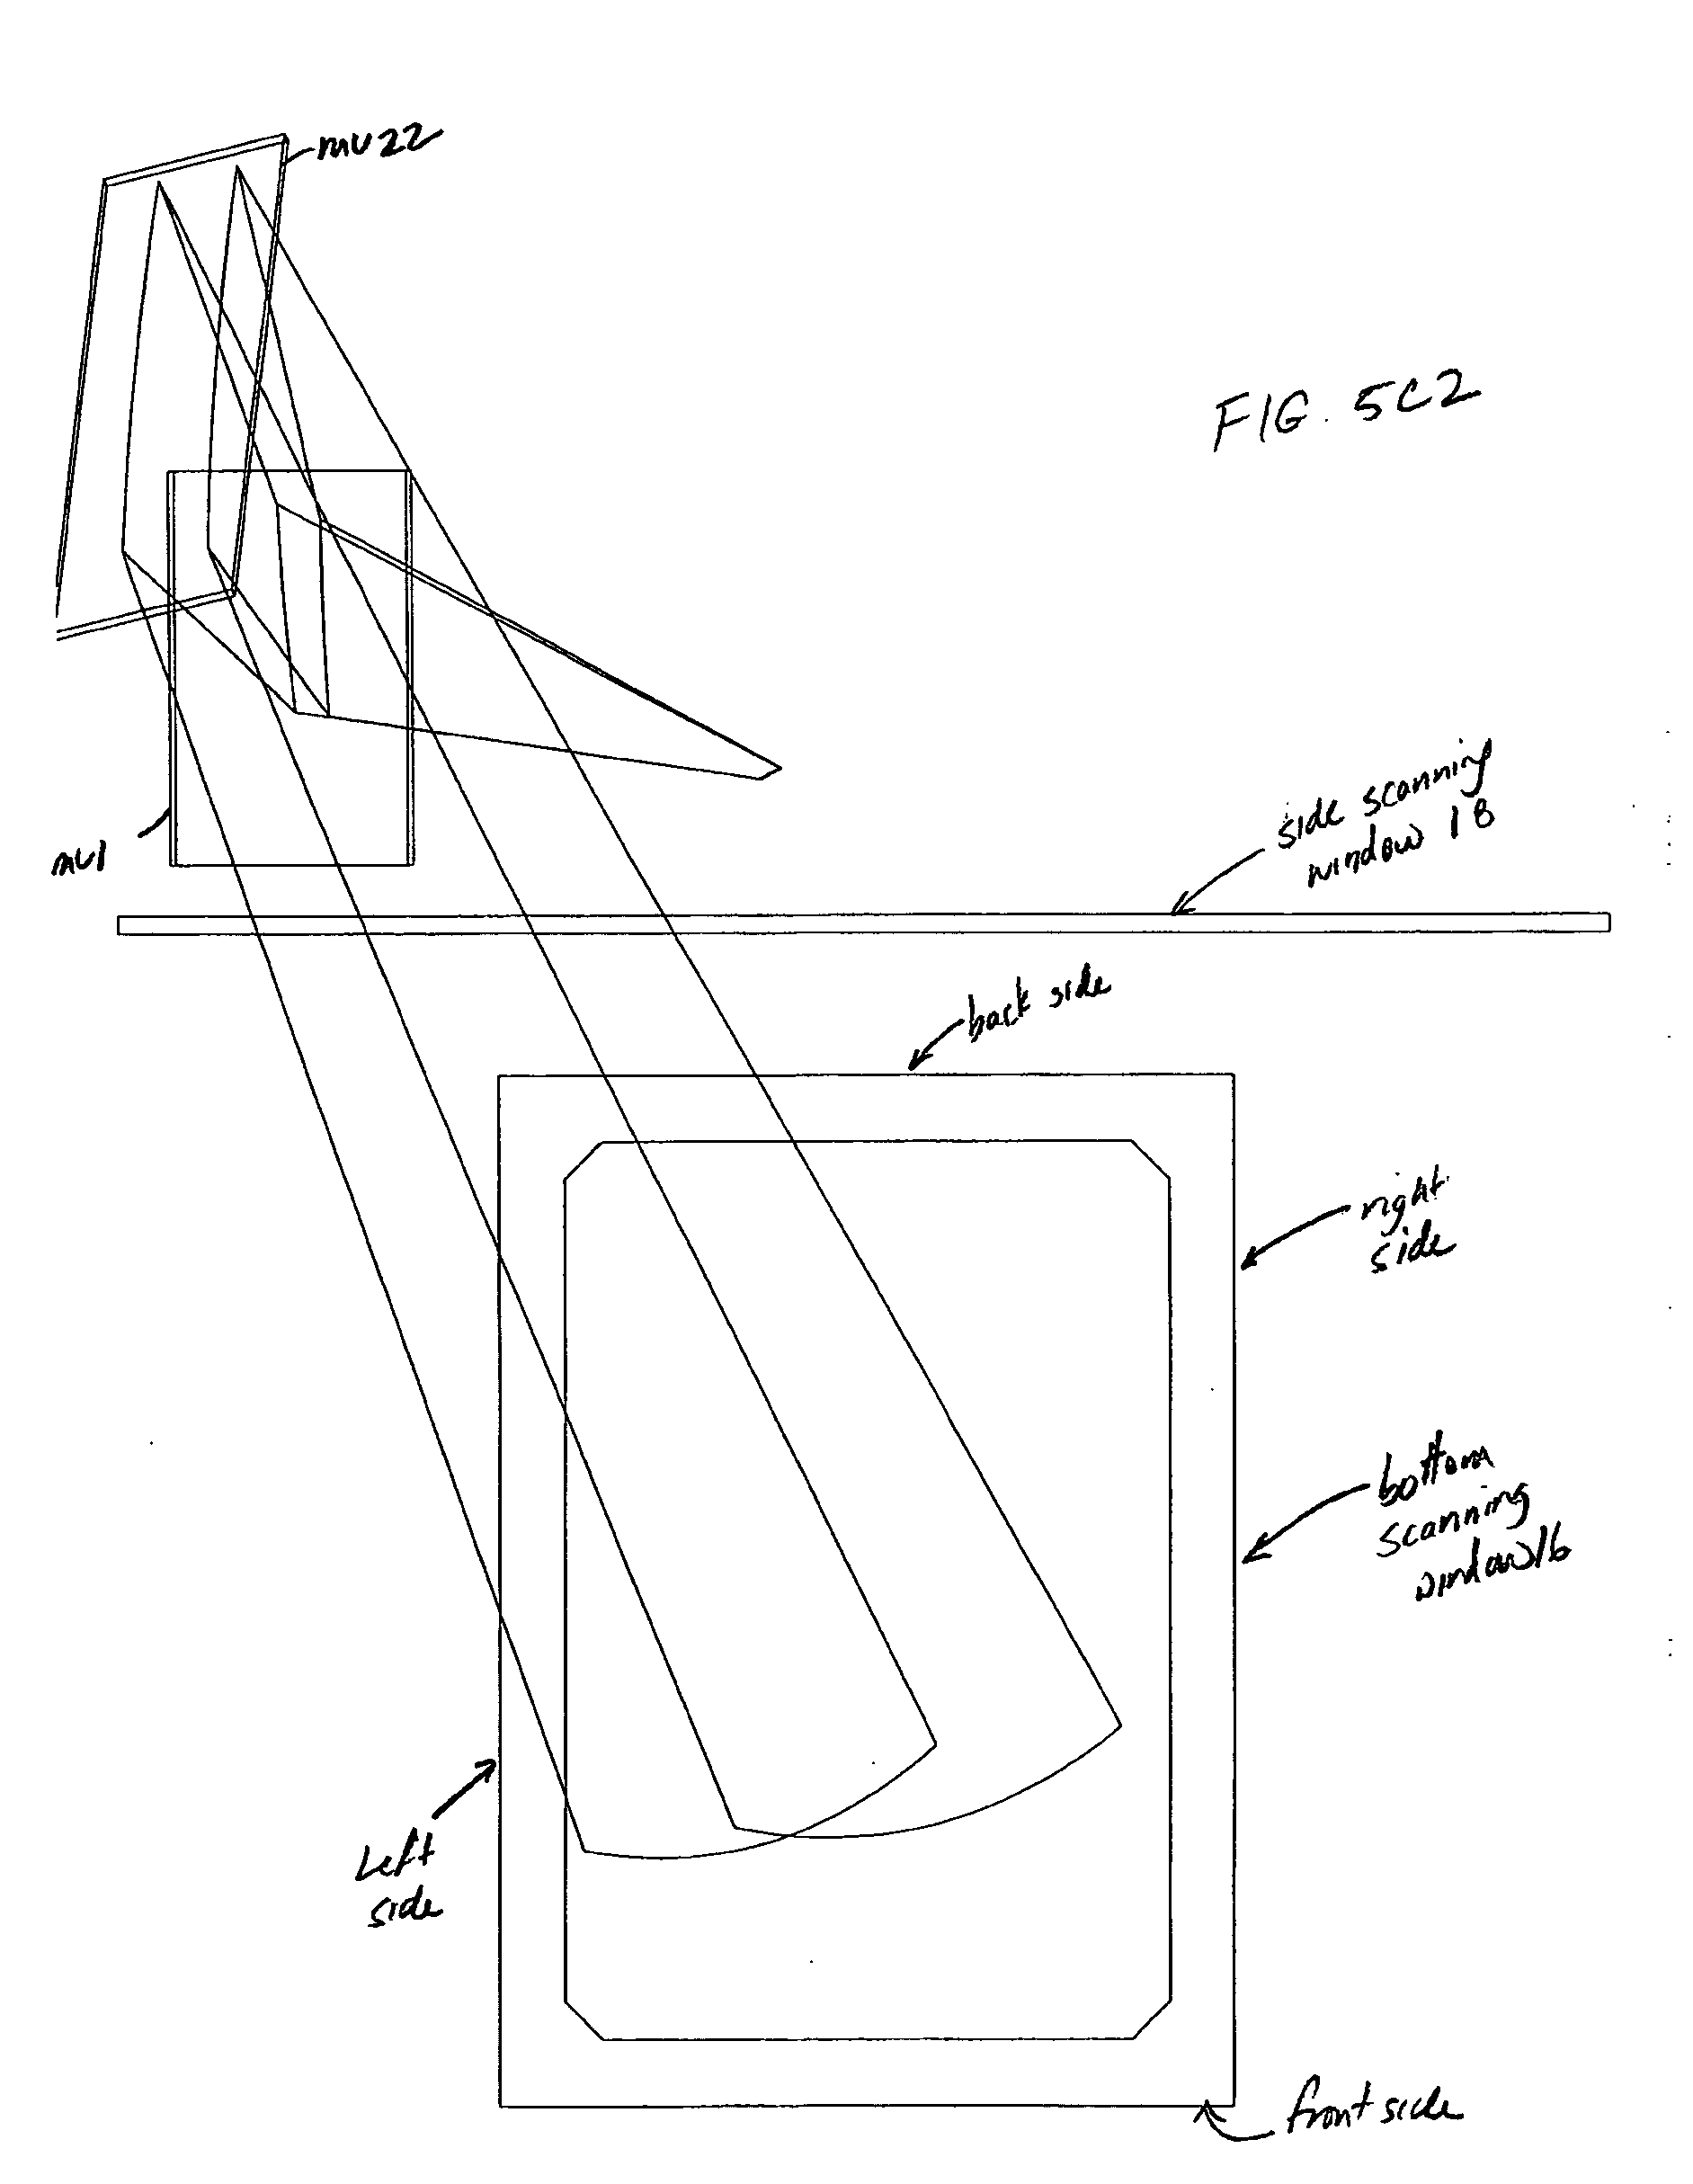 photocell switch line diagram wiring diagram database 208 240 Volt Wiring patent us 7 341 192 b2 12 volt marine wiring diagram photocell switch line diagram